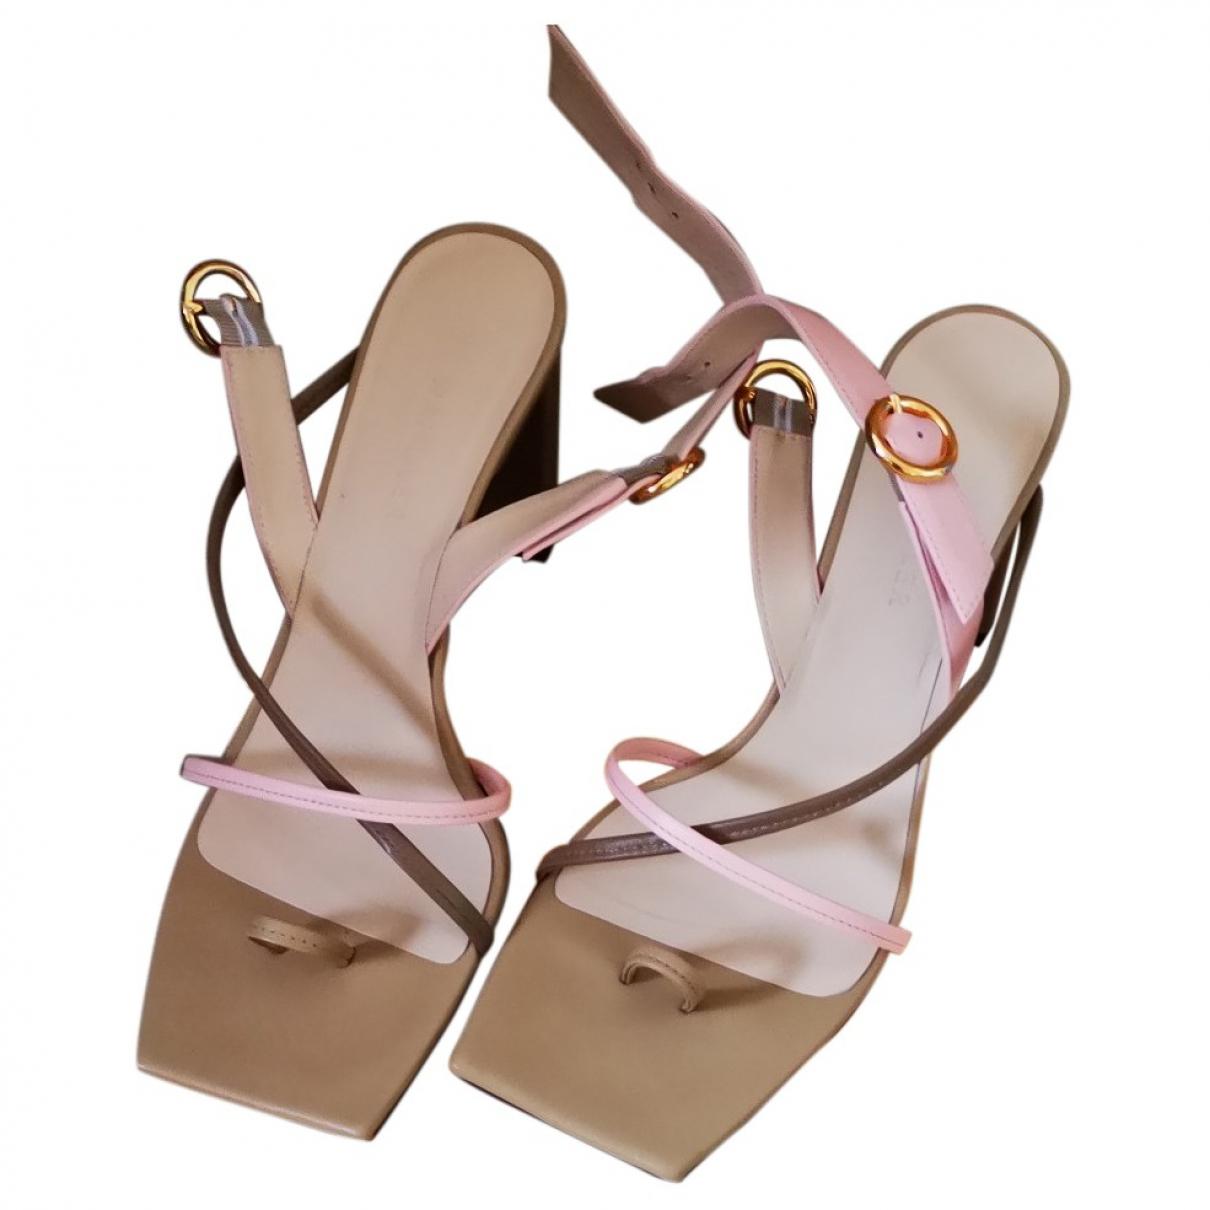 Wandler \N Beige Leather Sandals for Women 38 EU